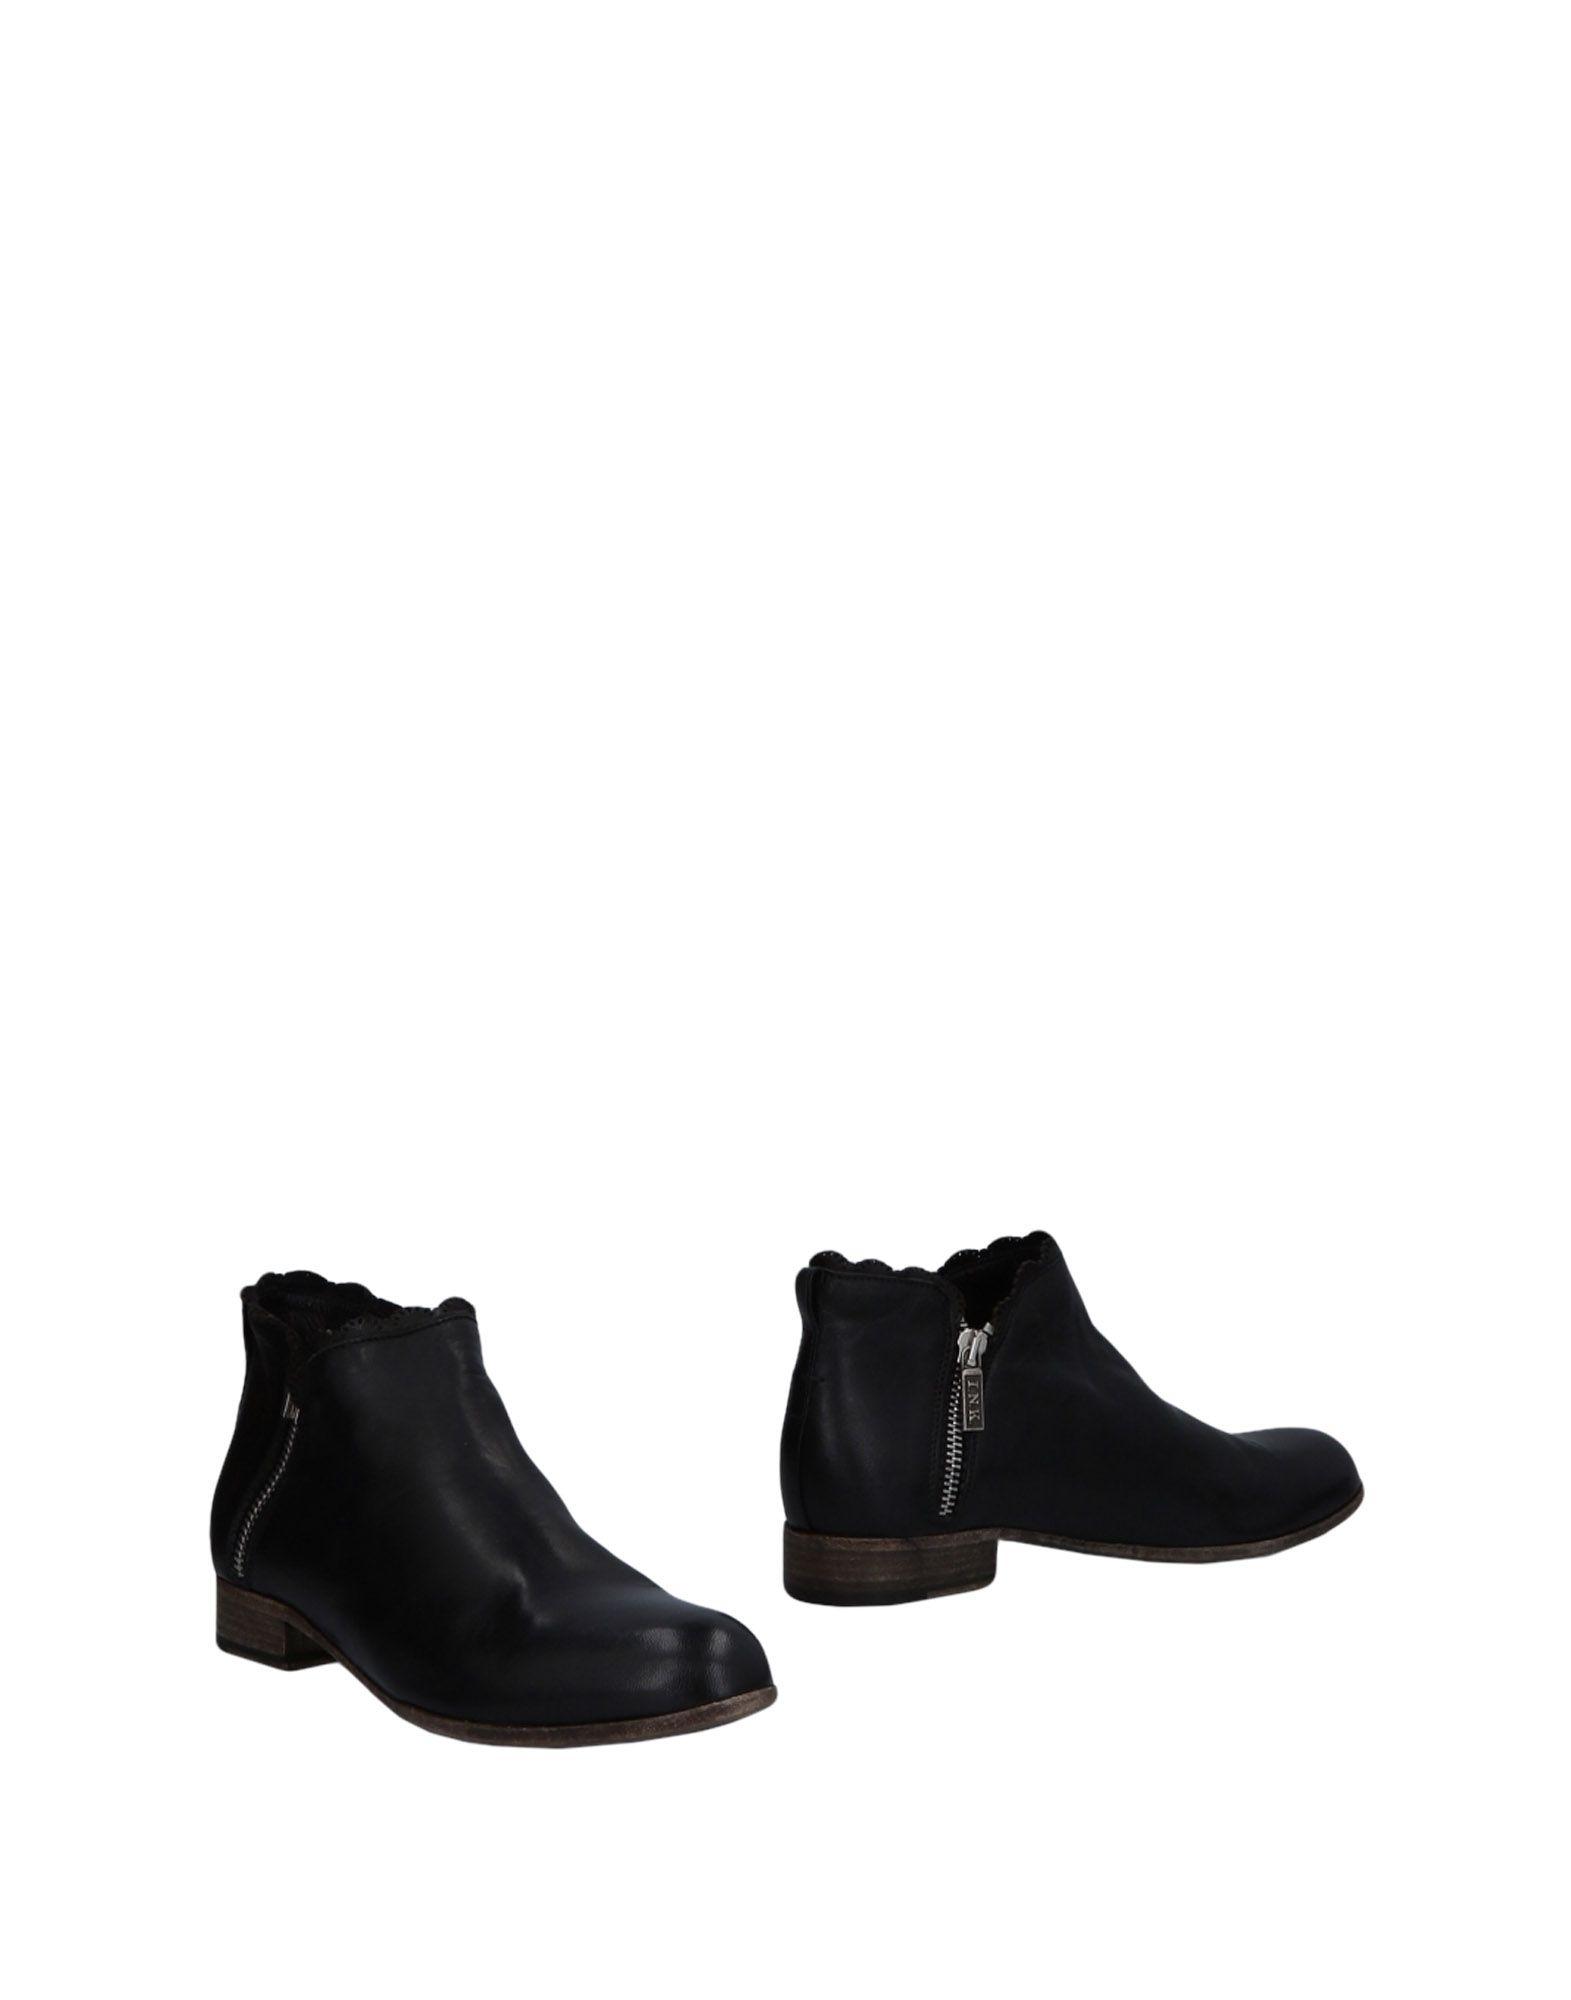 Stivaletti I.N.K. Shoes Donna - Acquista online su